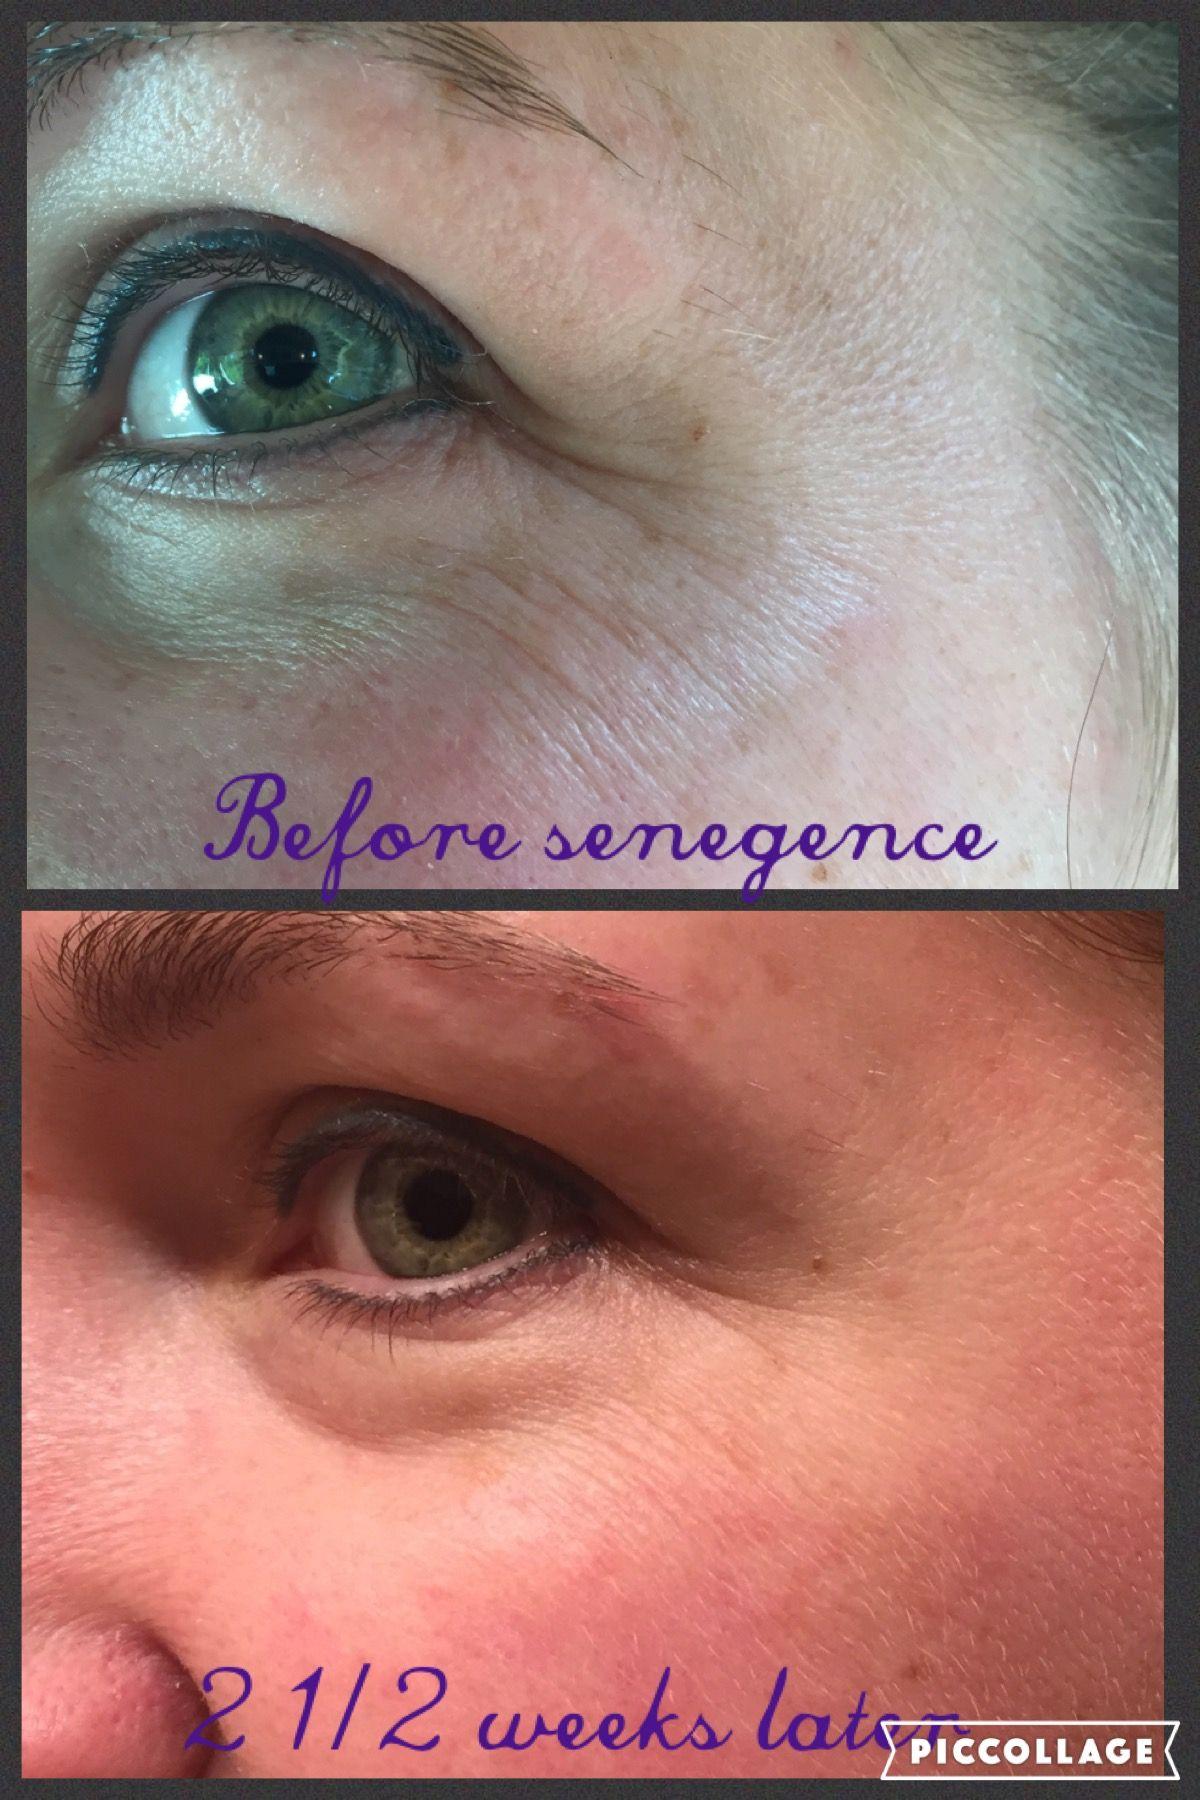 Senegence skincare results. distributor#198562